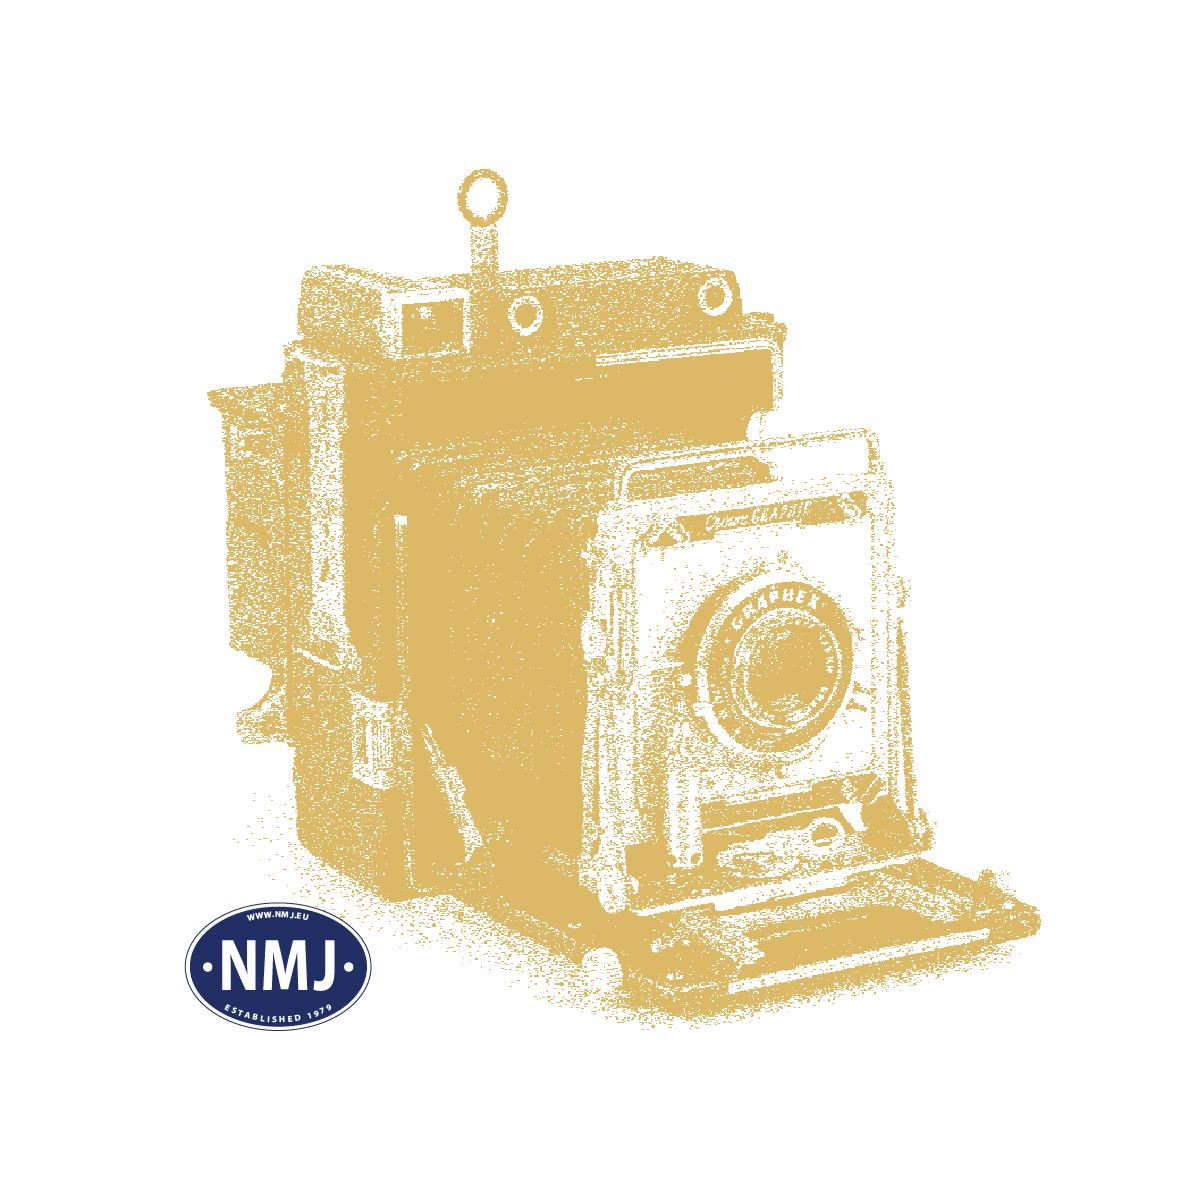 NMJT84.102AC - NMJ Topline NSB BM69A.07, AC digital